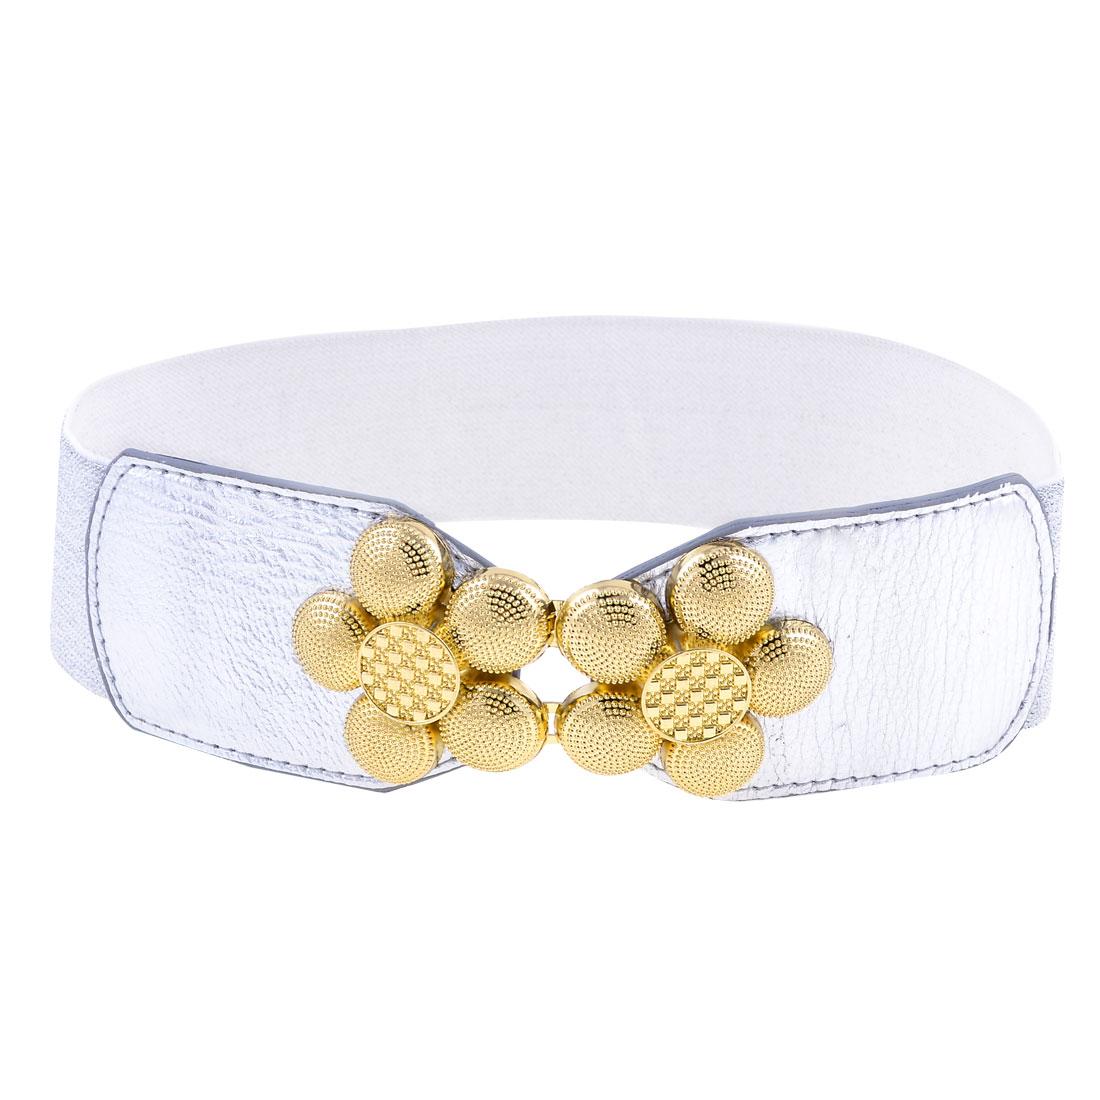 Gold Tone Flower Shaped Interlocking Buckle Silver Tone Elastic Waist Belt